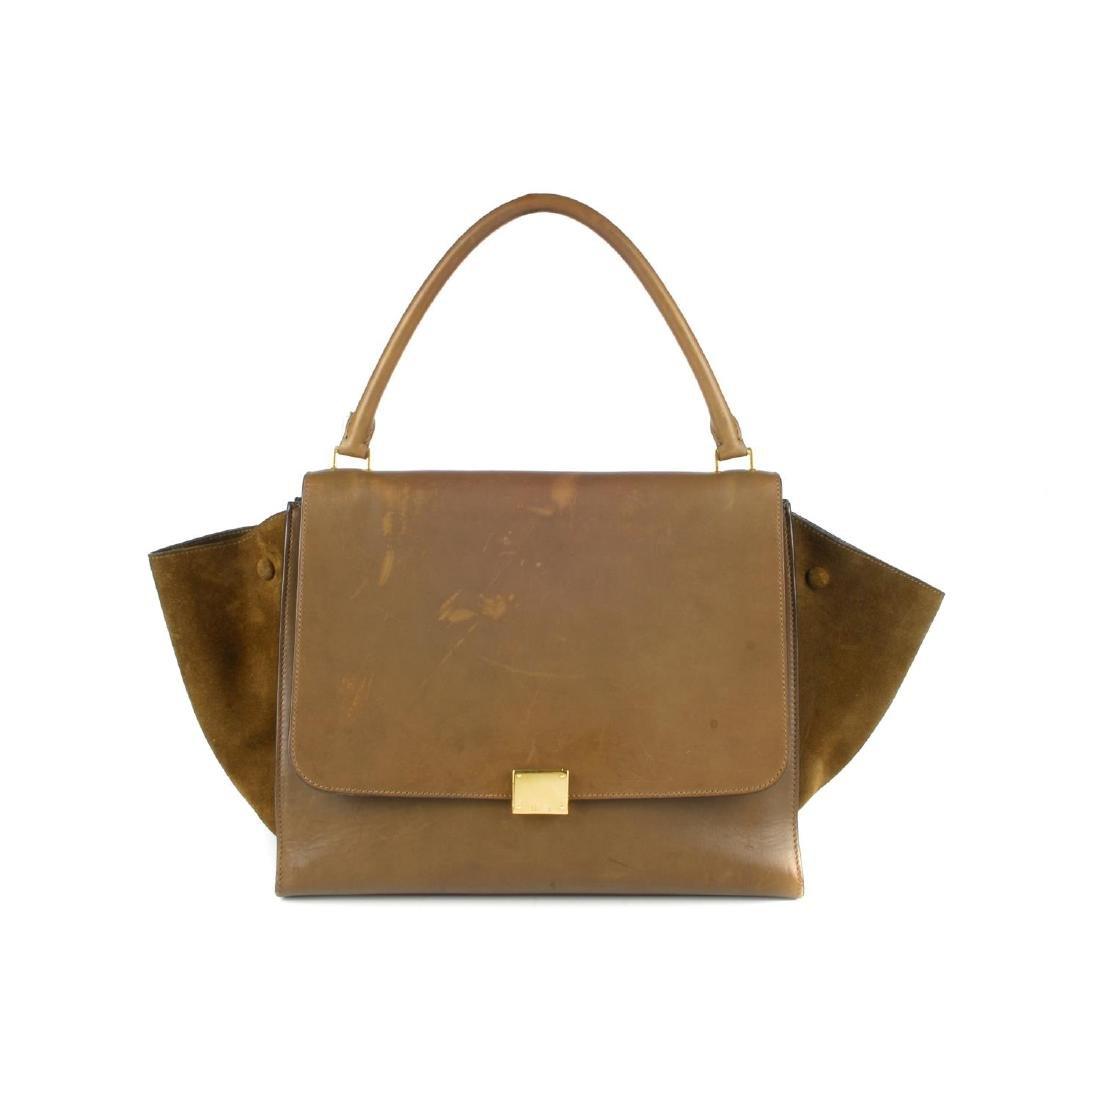 CÉLINE - a khaki leather Trapeze handbag. Featuring a